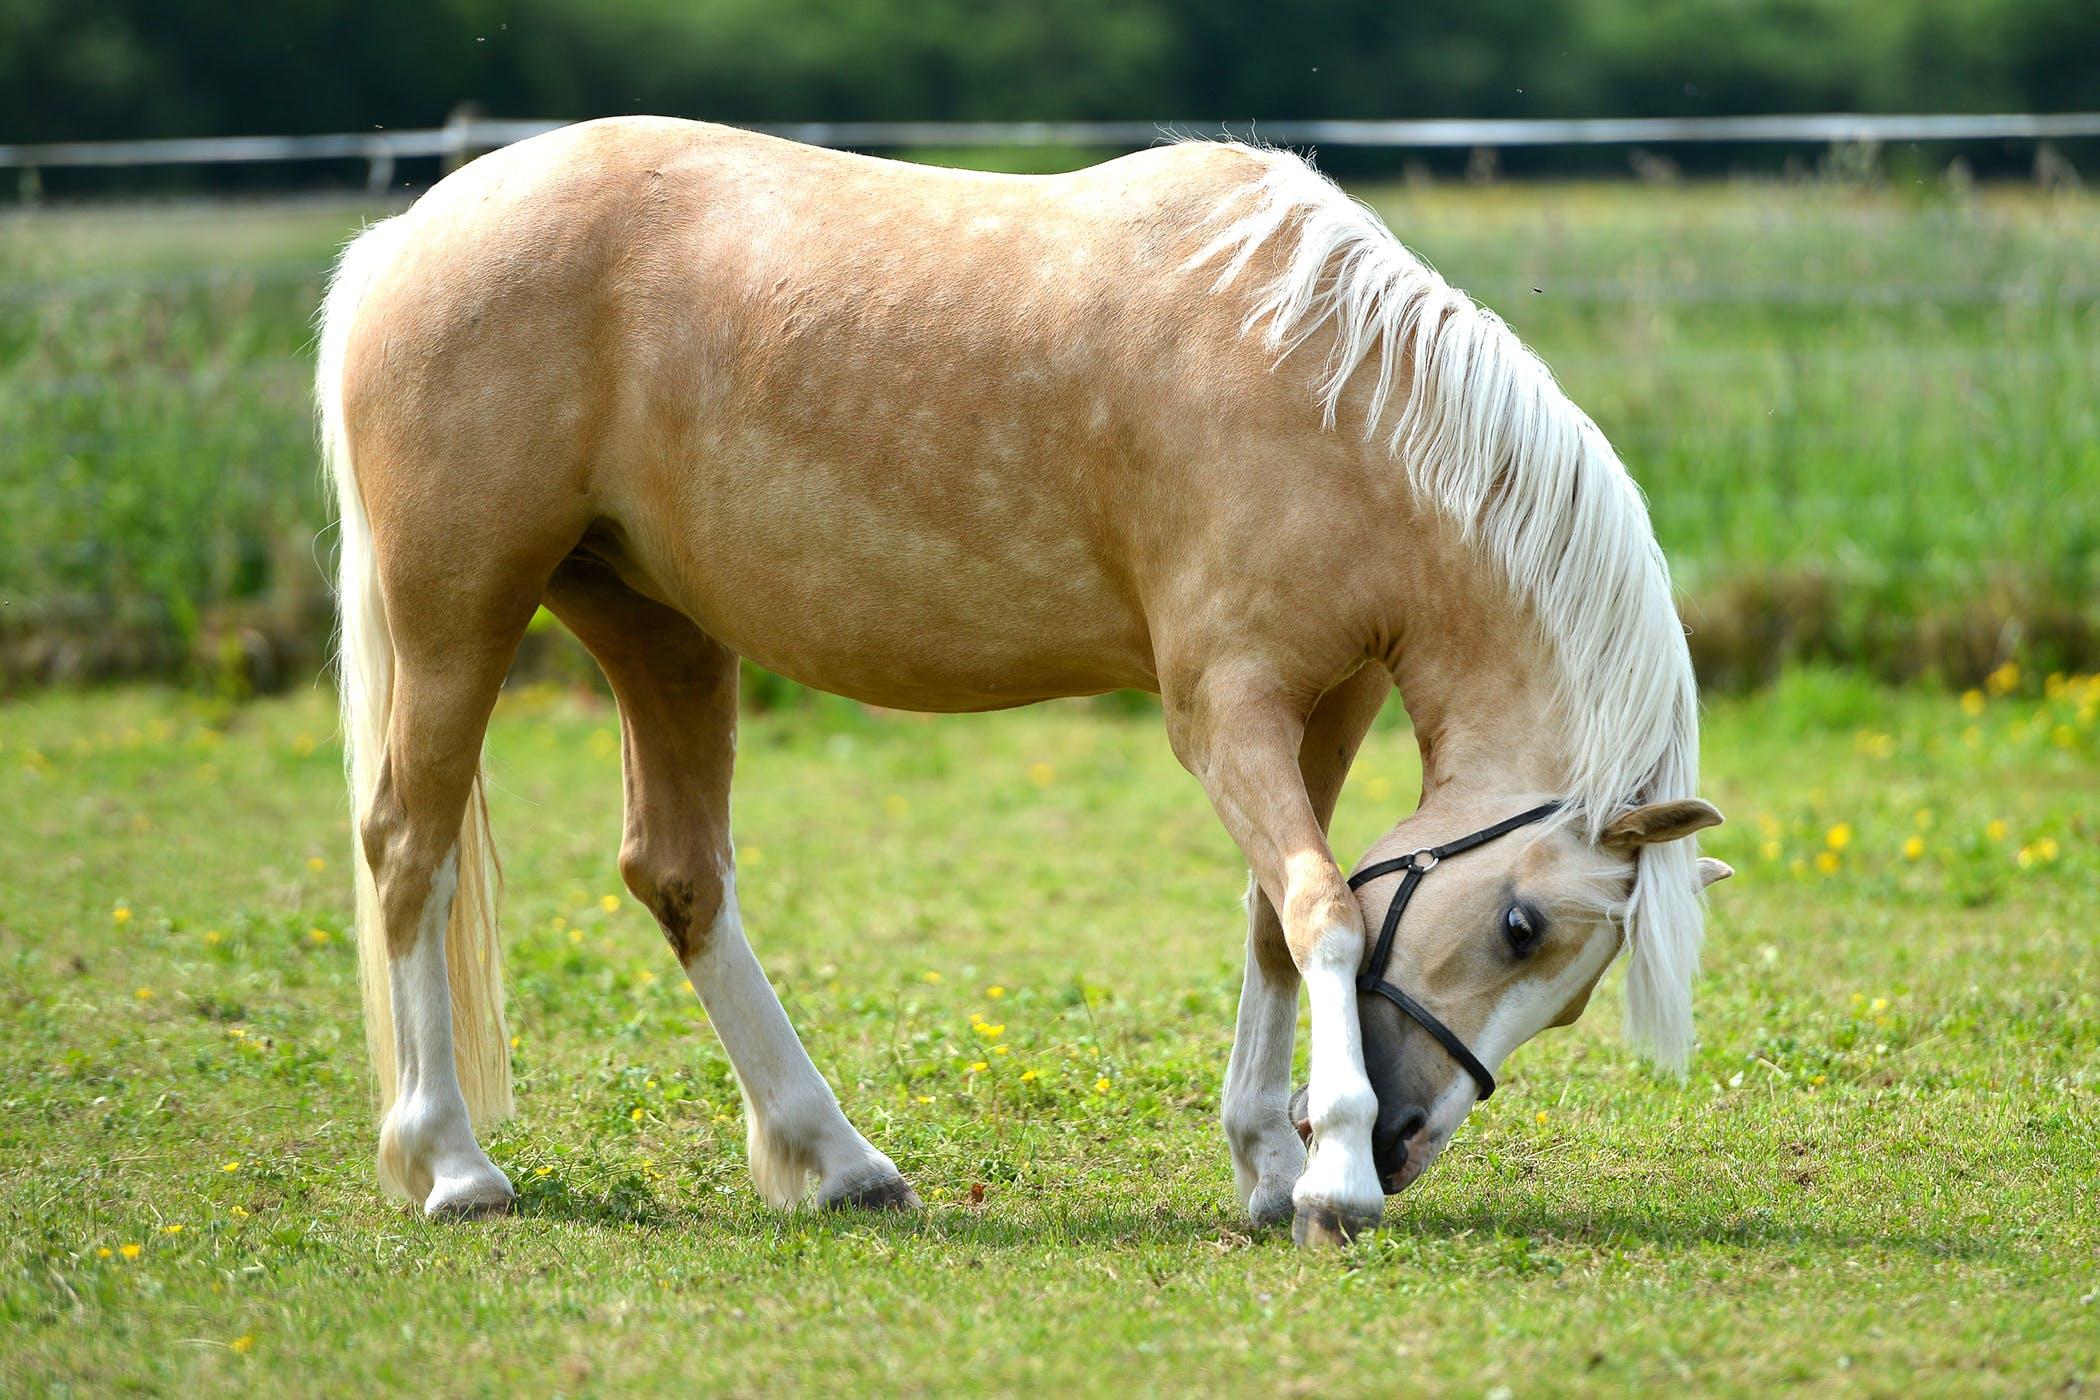 Bot Flies in Horses - Symptoms, Causes, Diagnosis, Treatment